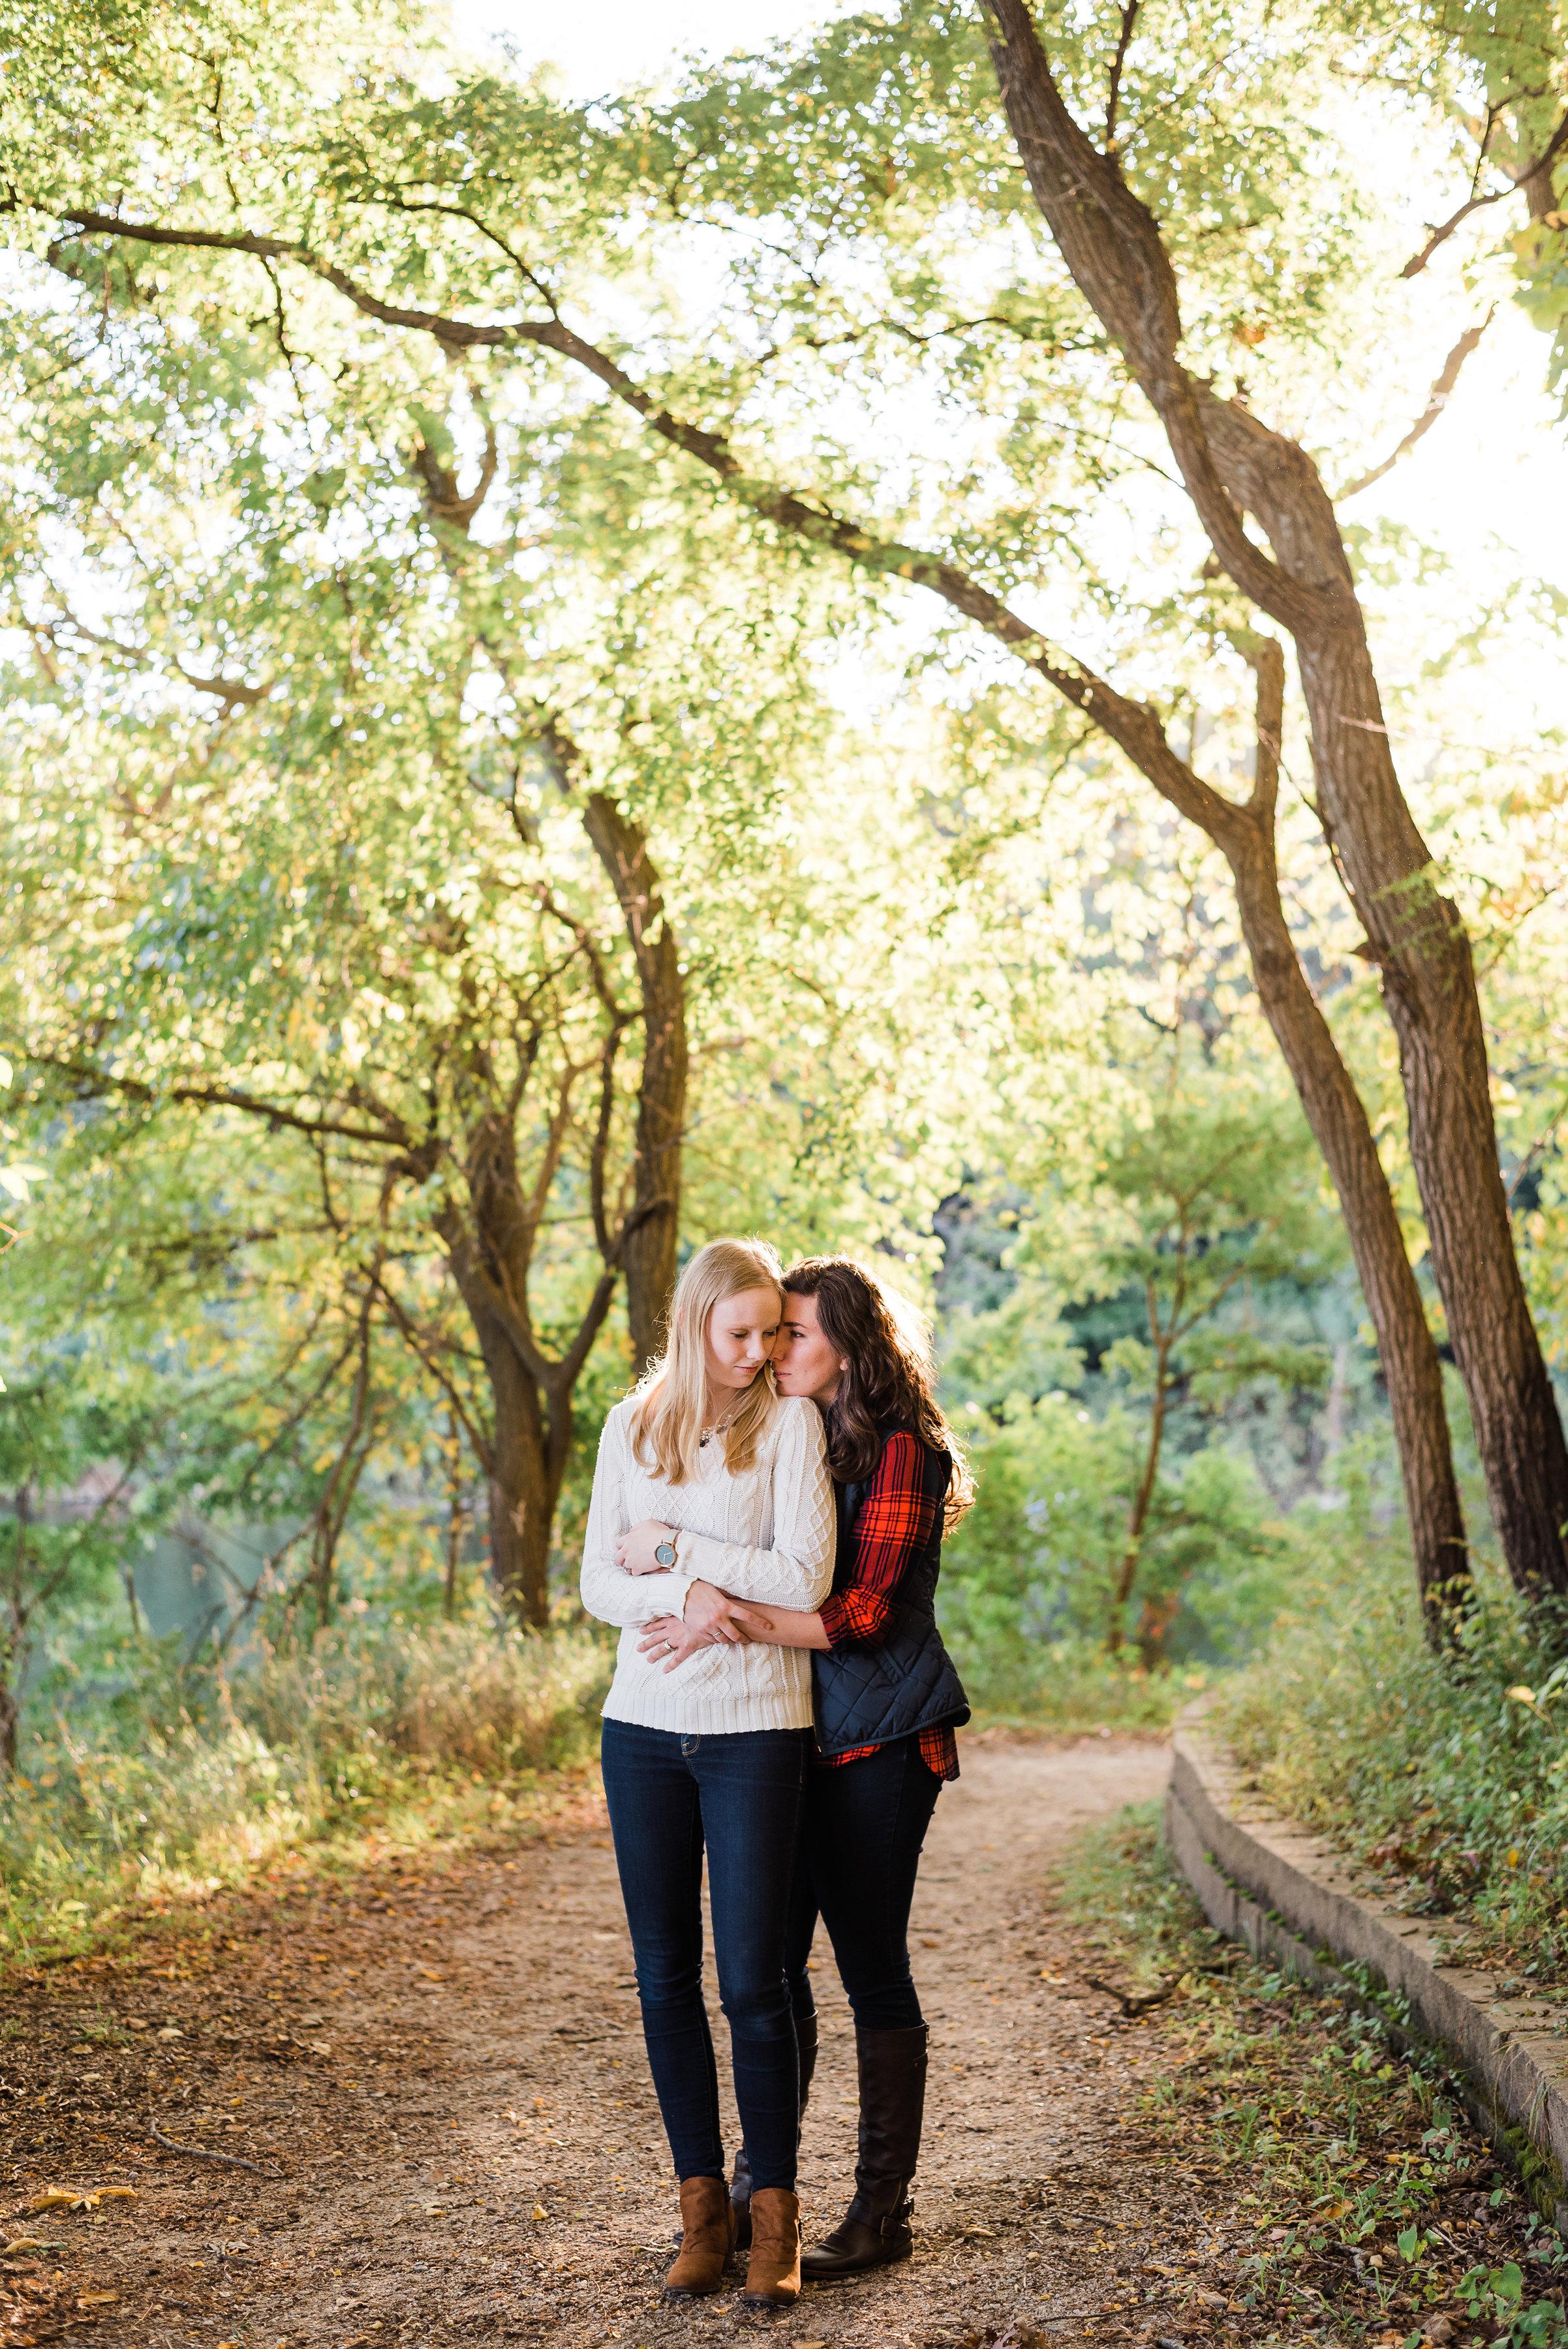 Macbride Lake State Park Engagement Session | Iowa City Wedding Photographer